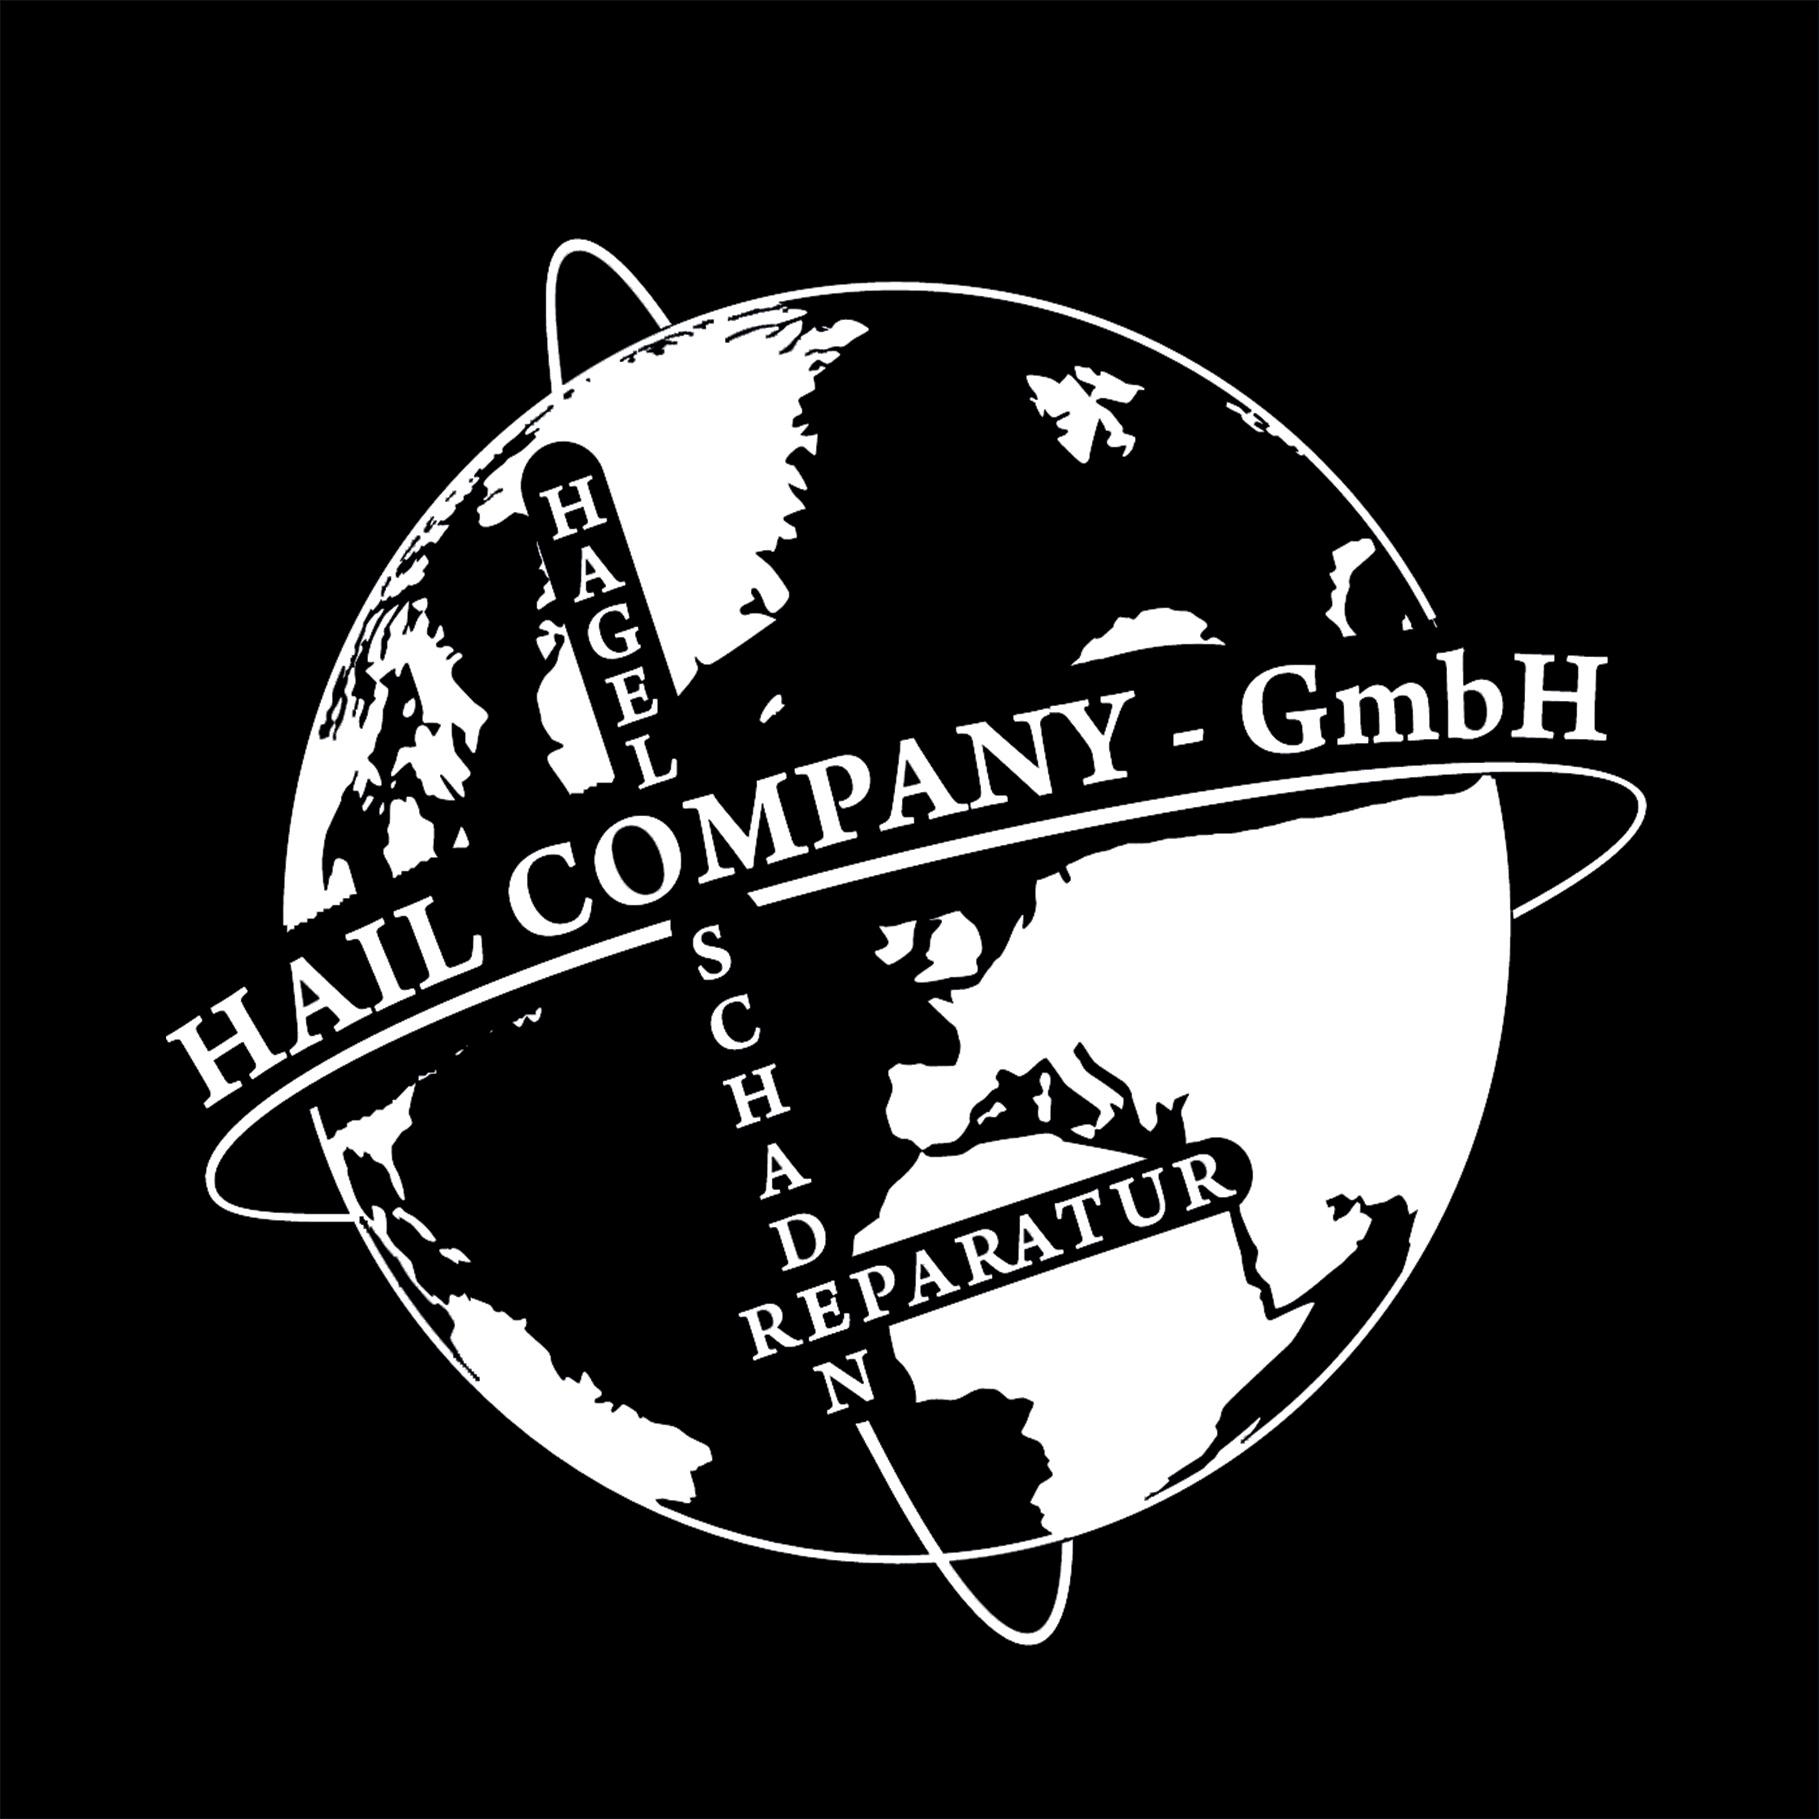 Logo der Dellenprofis der Hail Company